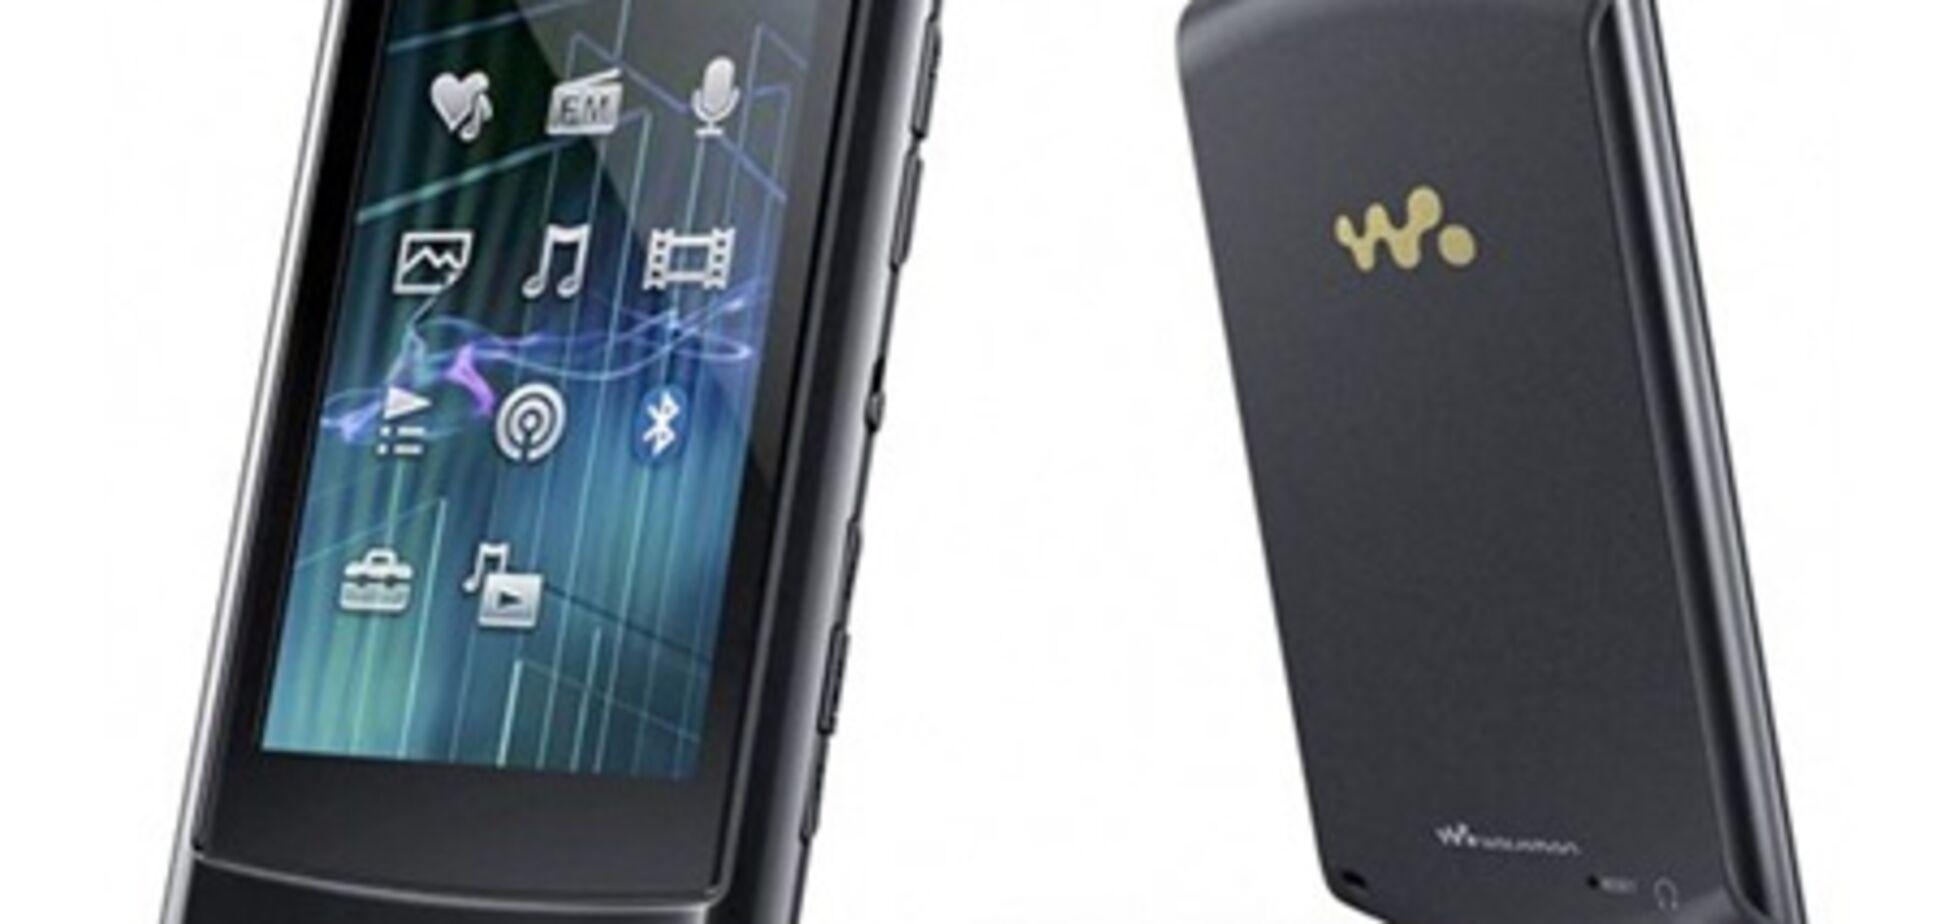 Sony Walkman делает ставку на кино